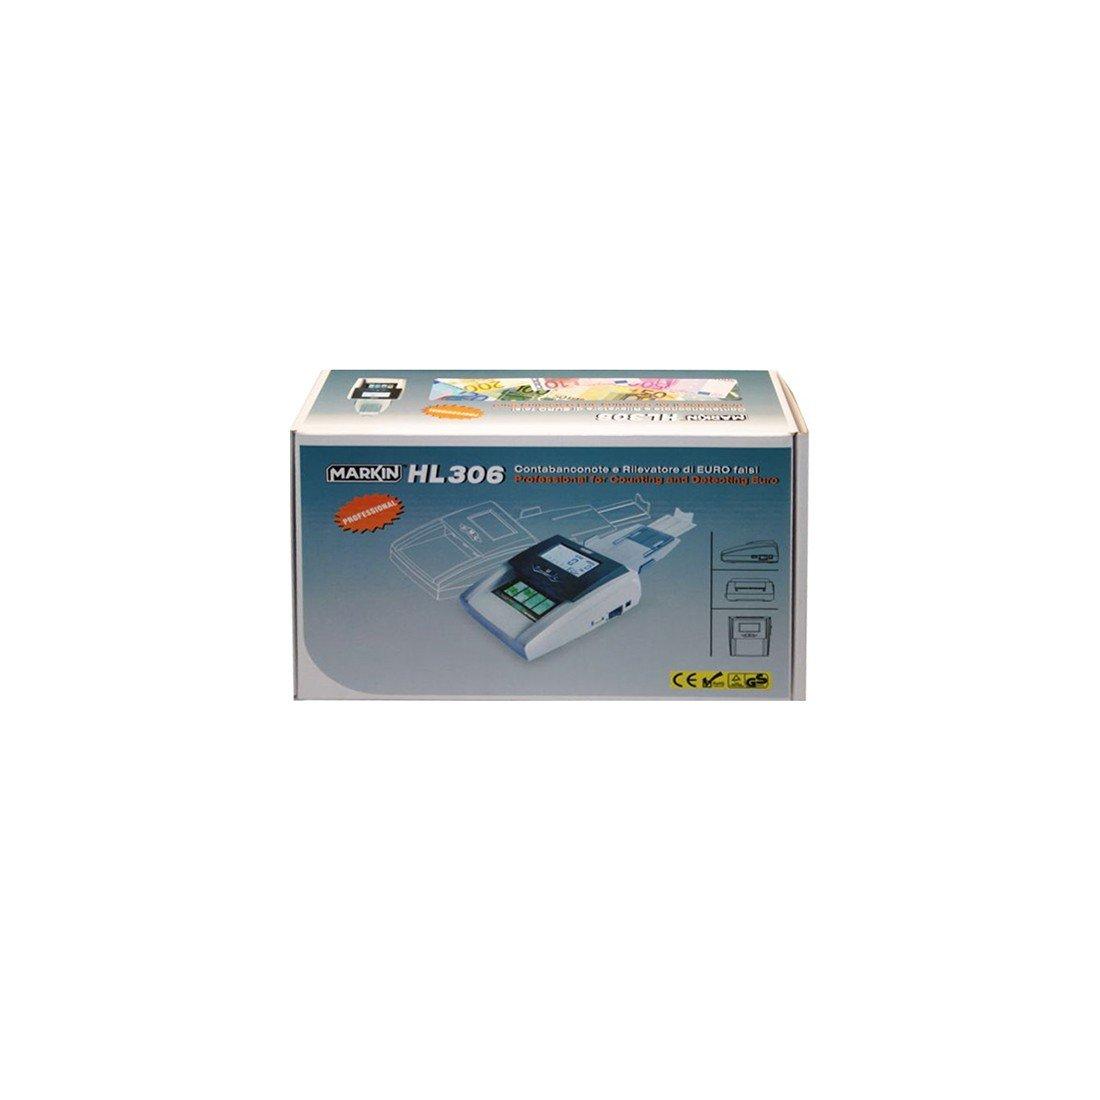 Markin HL306 Banknote counting machine Grigio, Bianco 340HL306